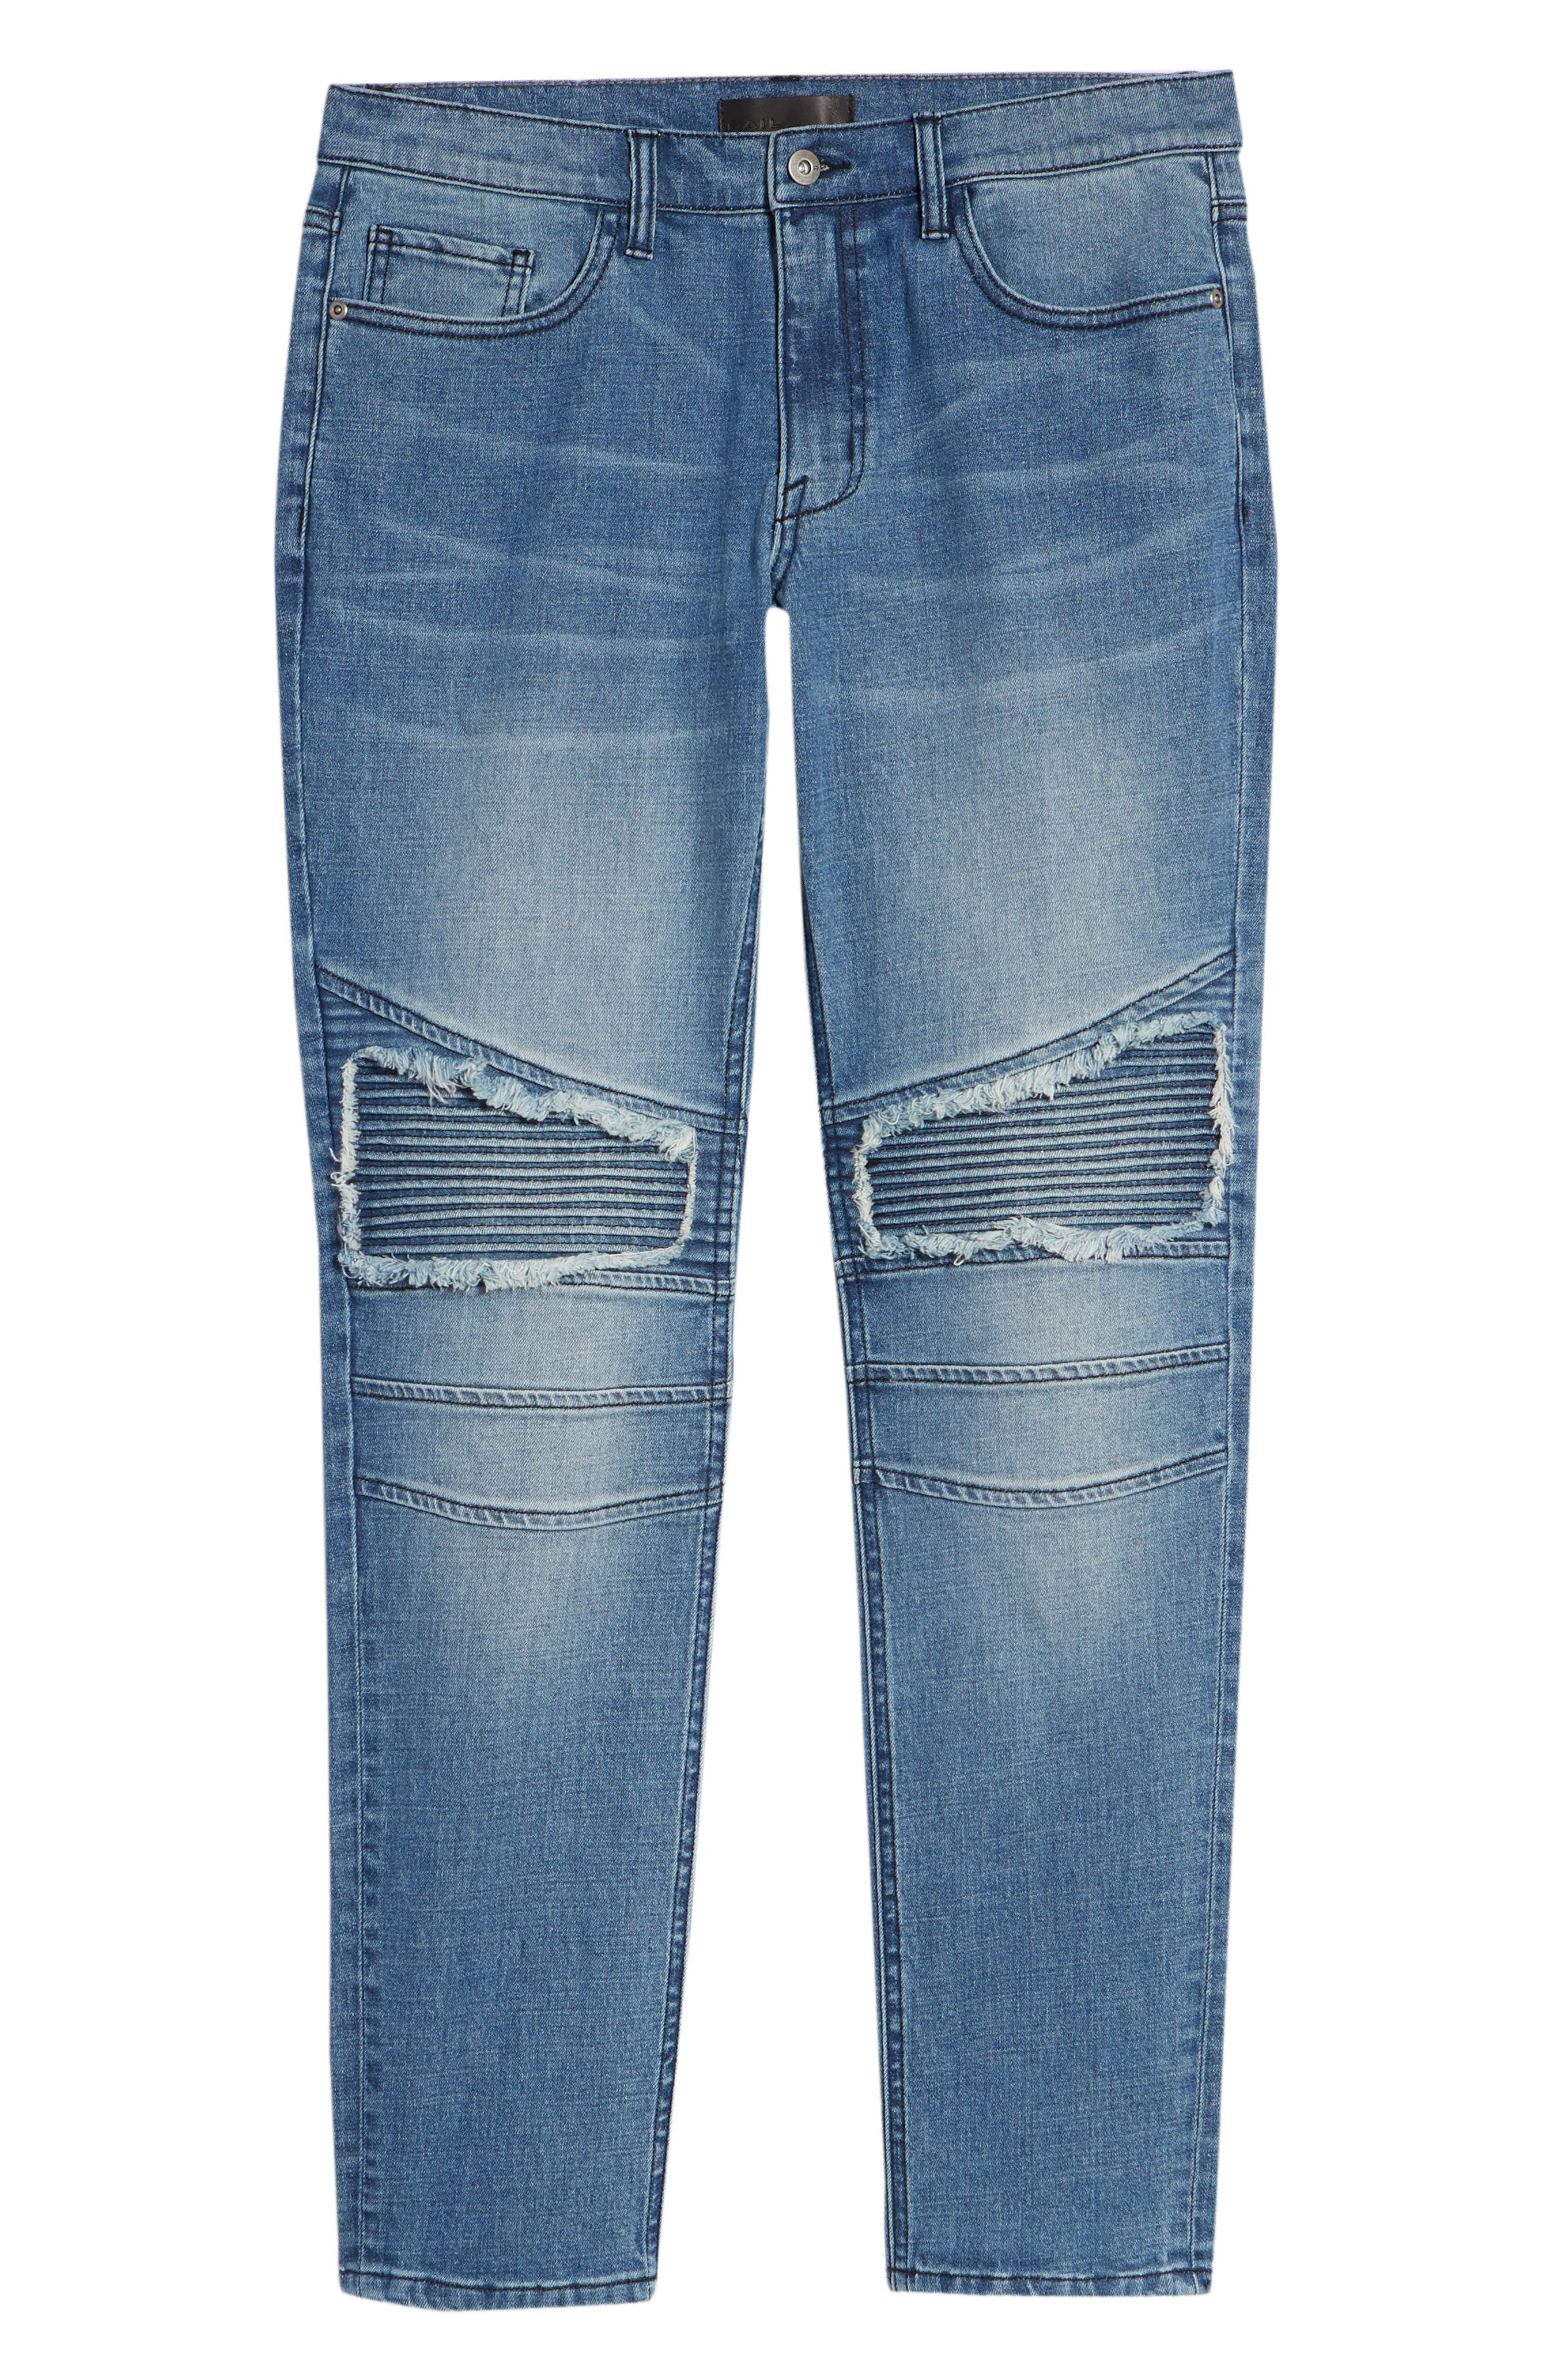 Skinny Moto Jeans,                             Alternate thumbnail 6, color,                             BLUE RIVERS WASH